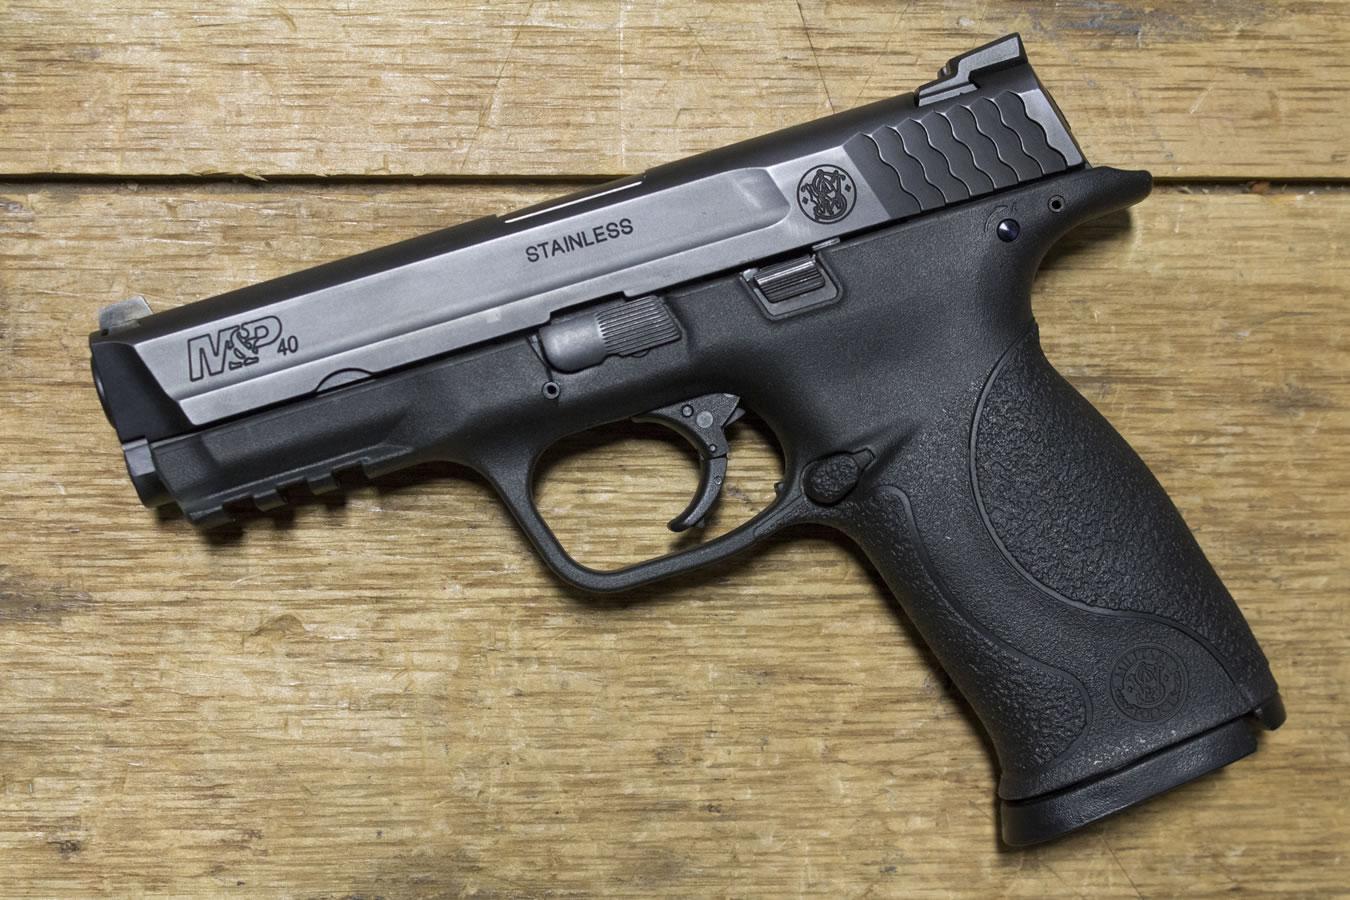 Smith & Wesson M&P 40